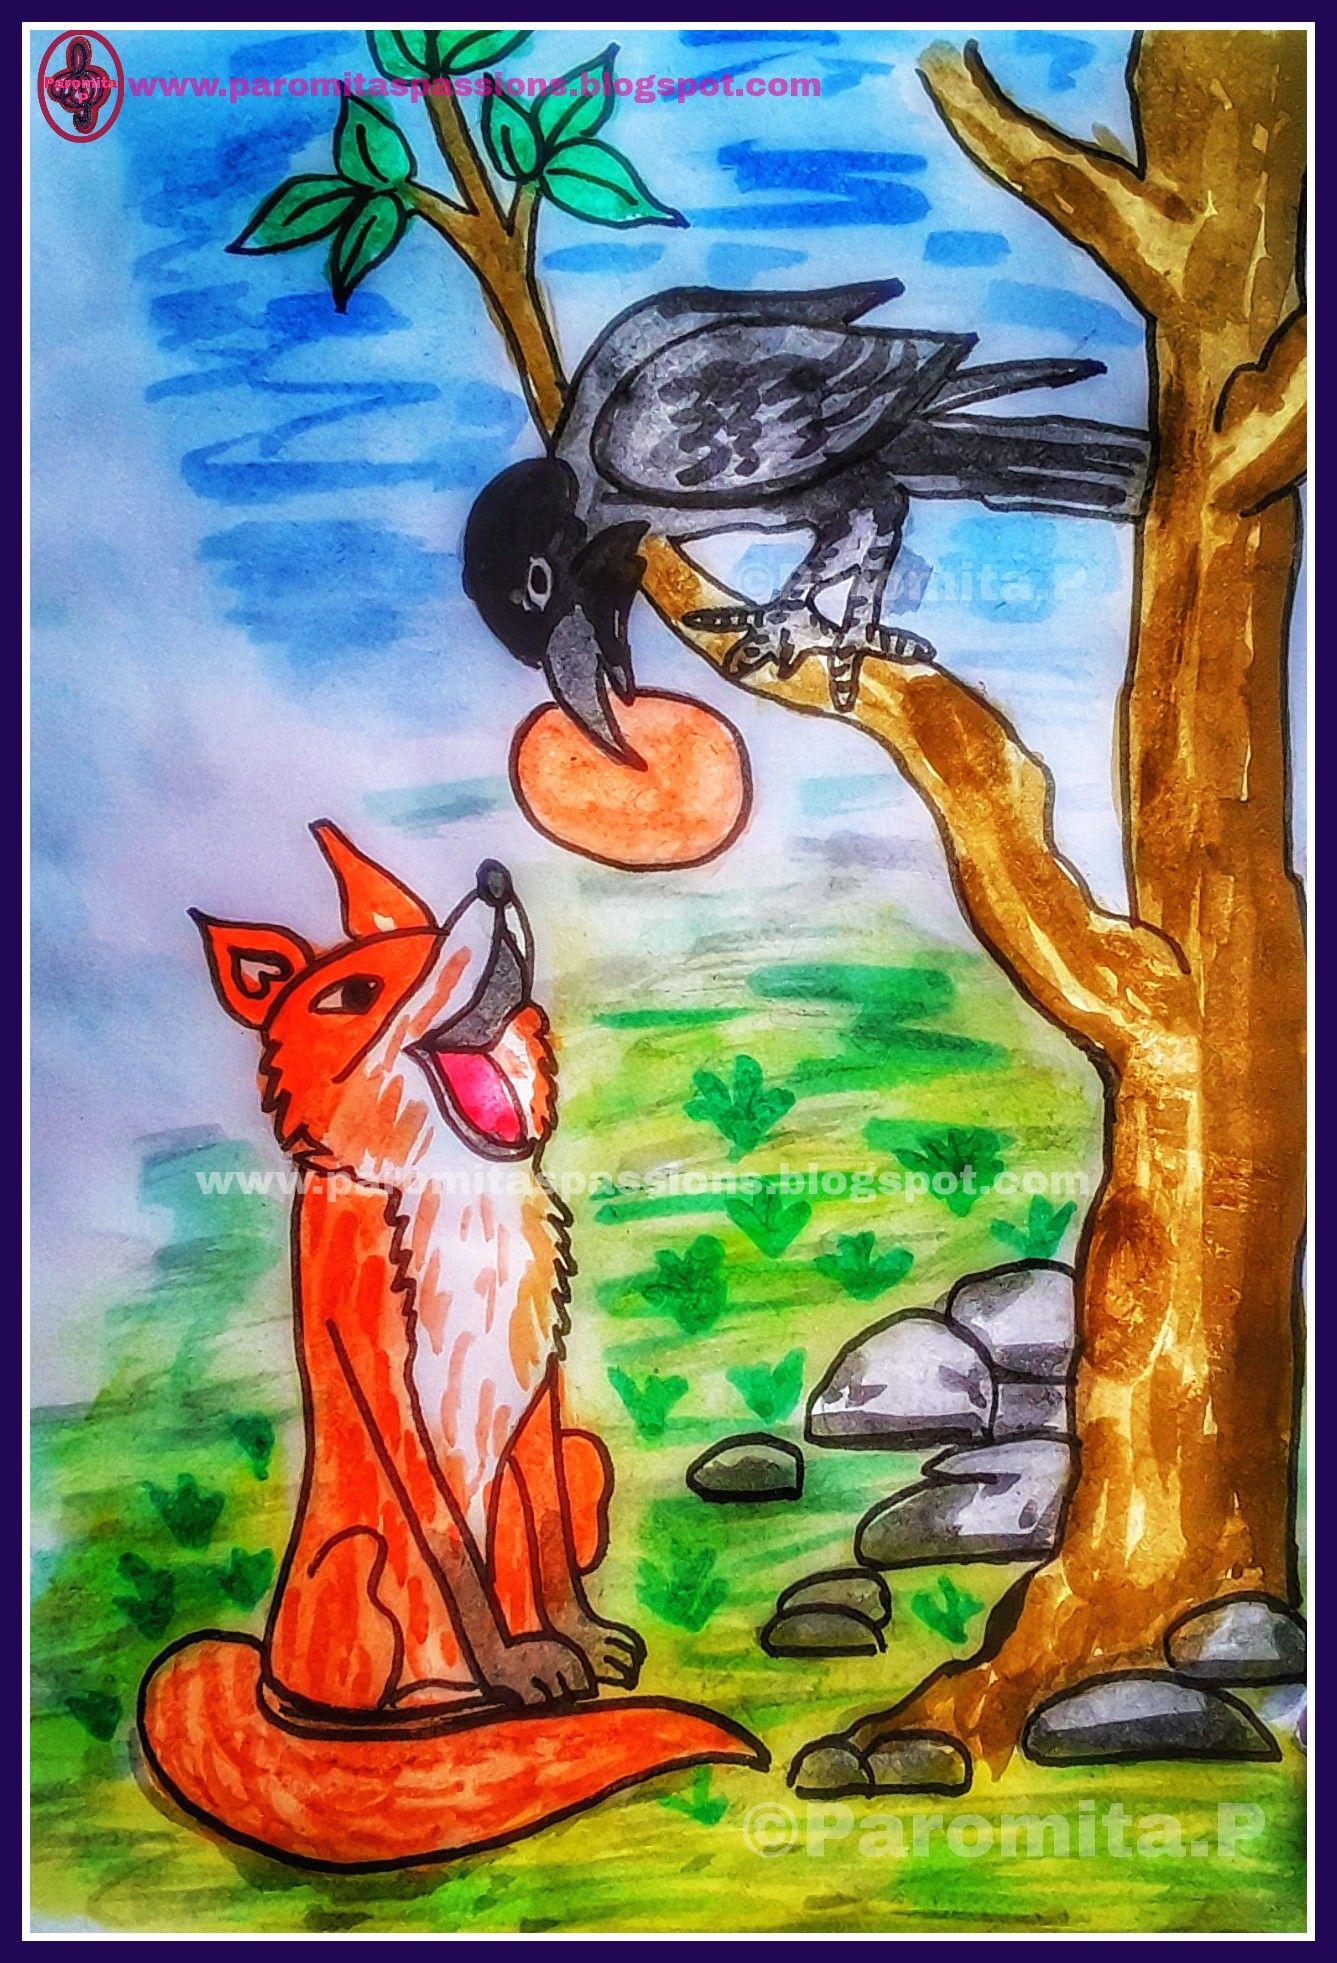 Hindi Story - Foolish Crow and Cunning Fox | Paromita's Stories